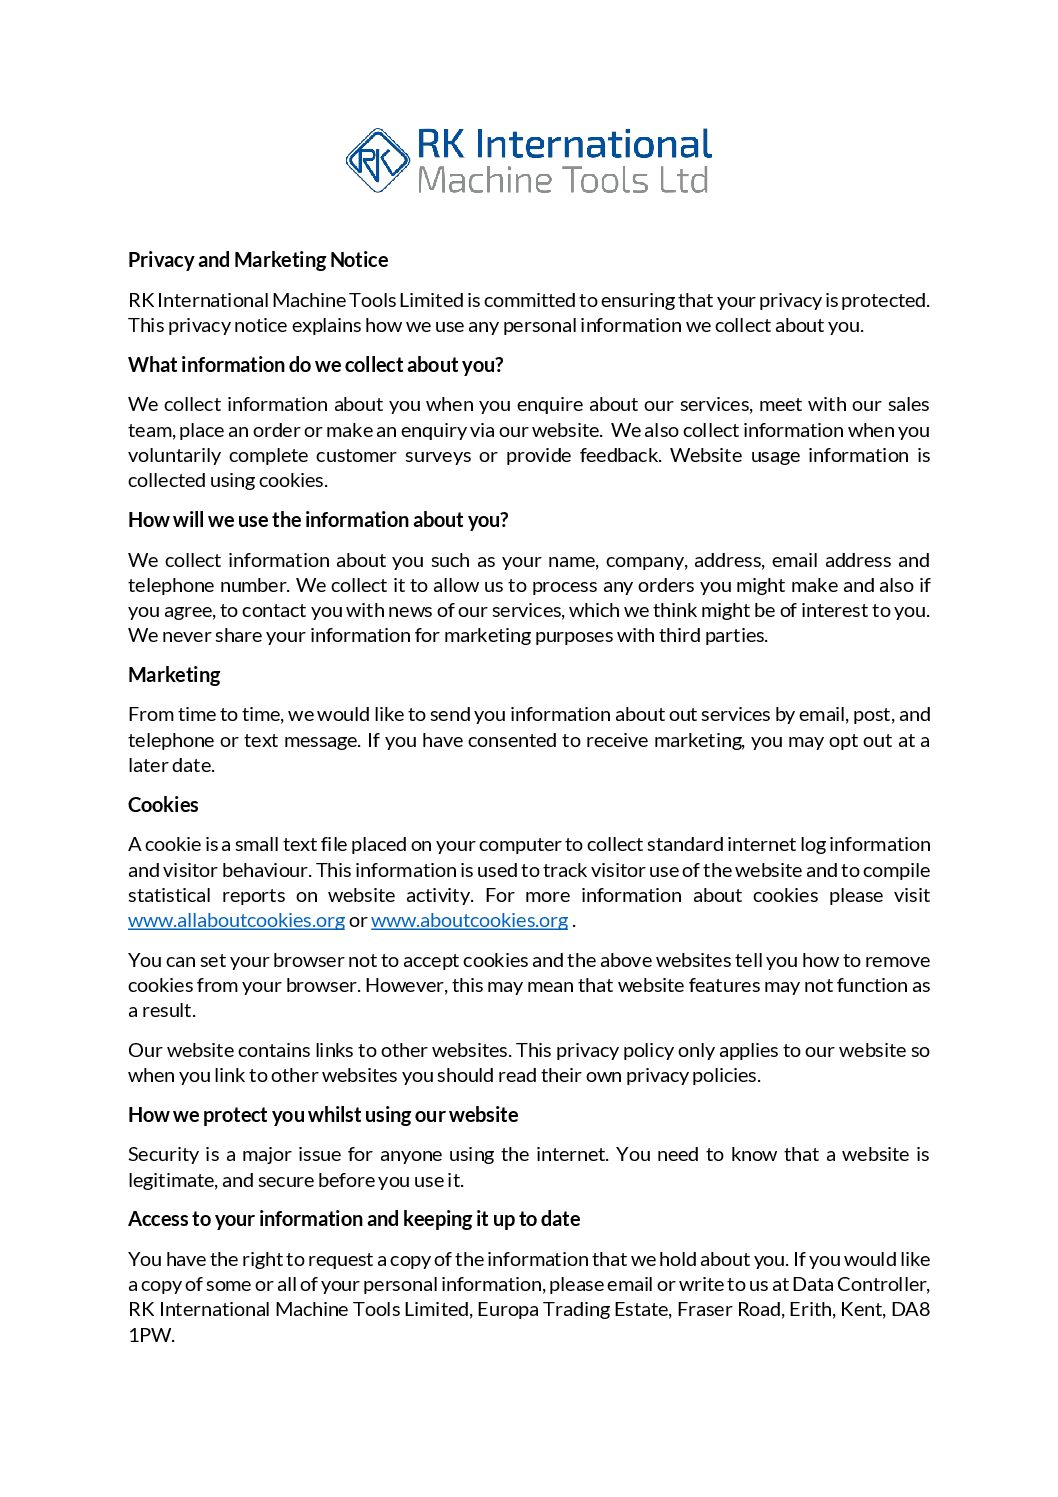 RK International Privacy and Marketing Notice 05 18 - RK